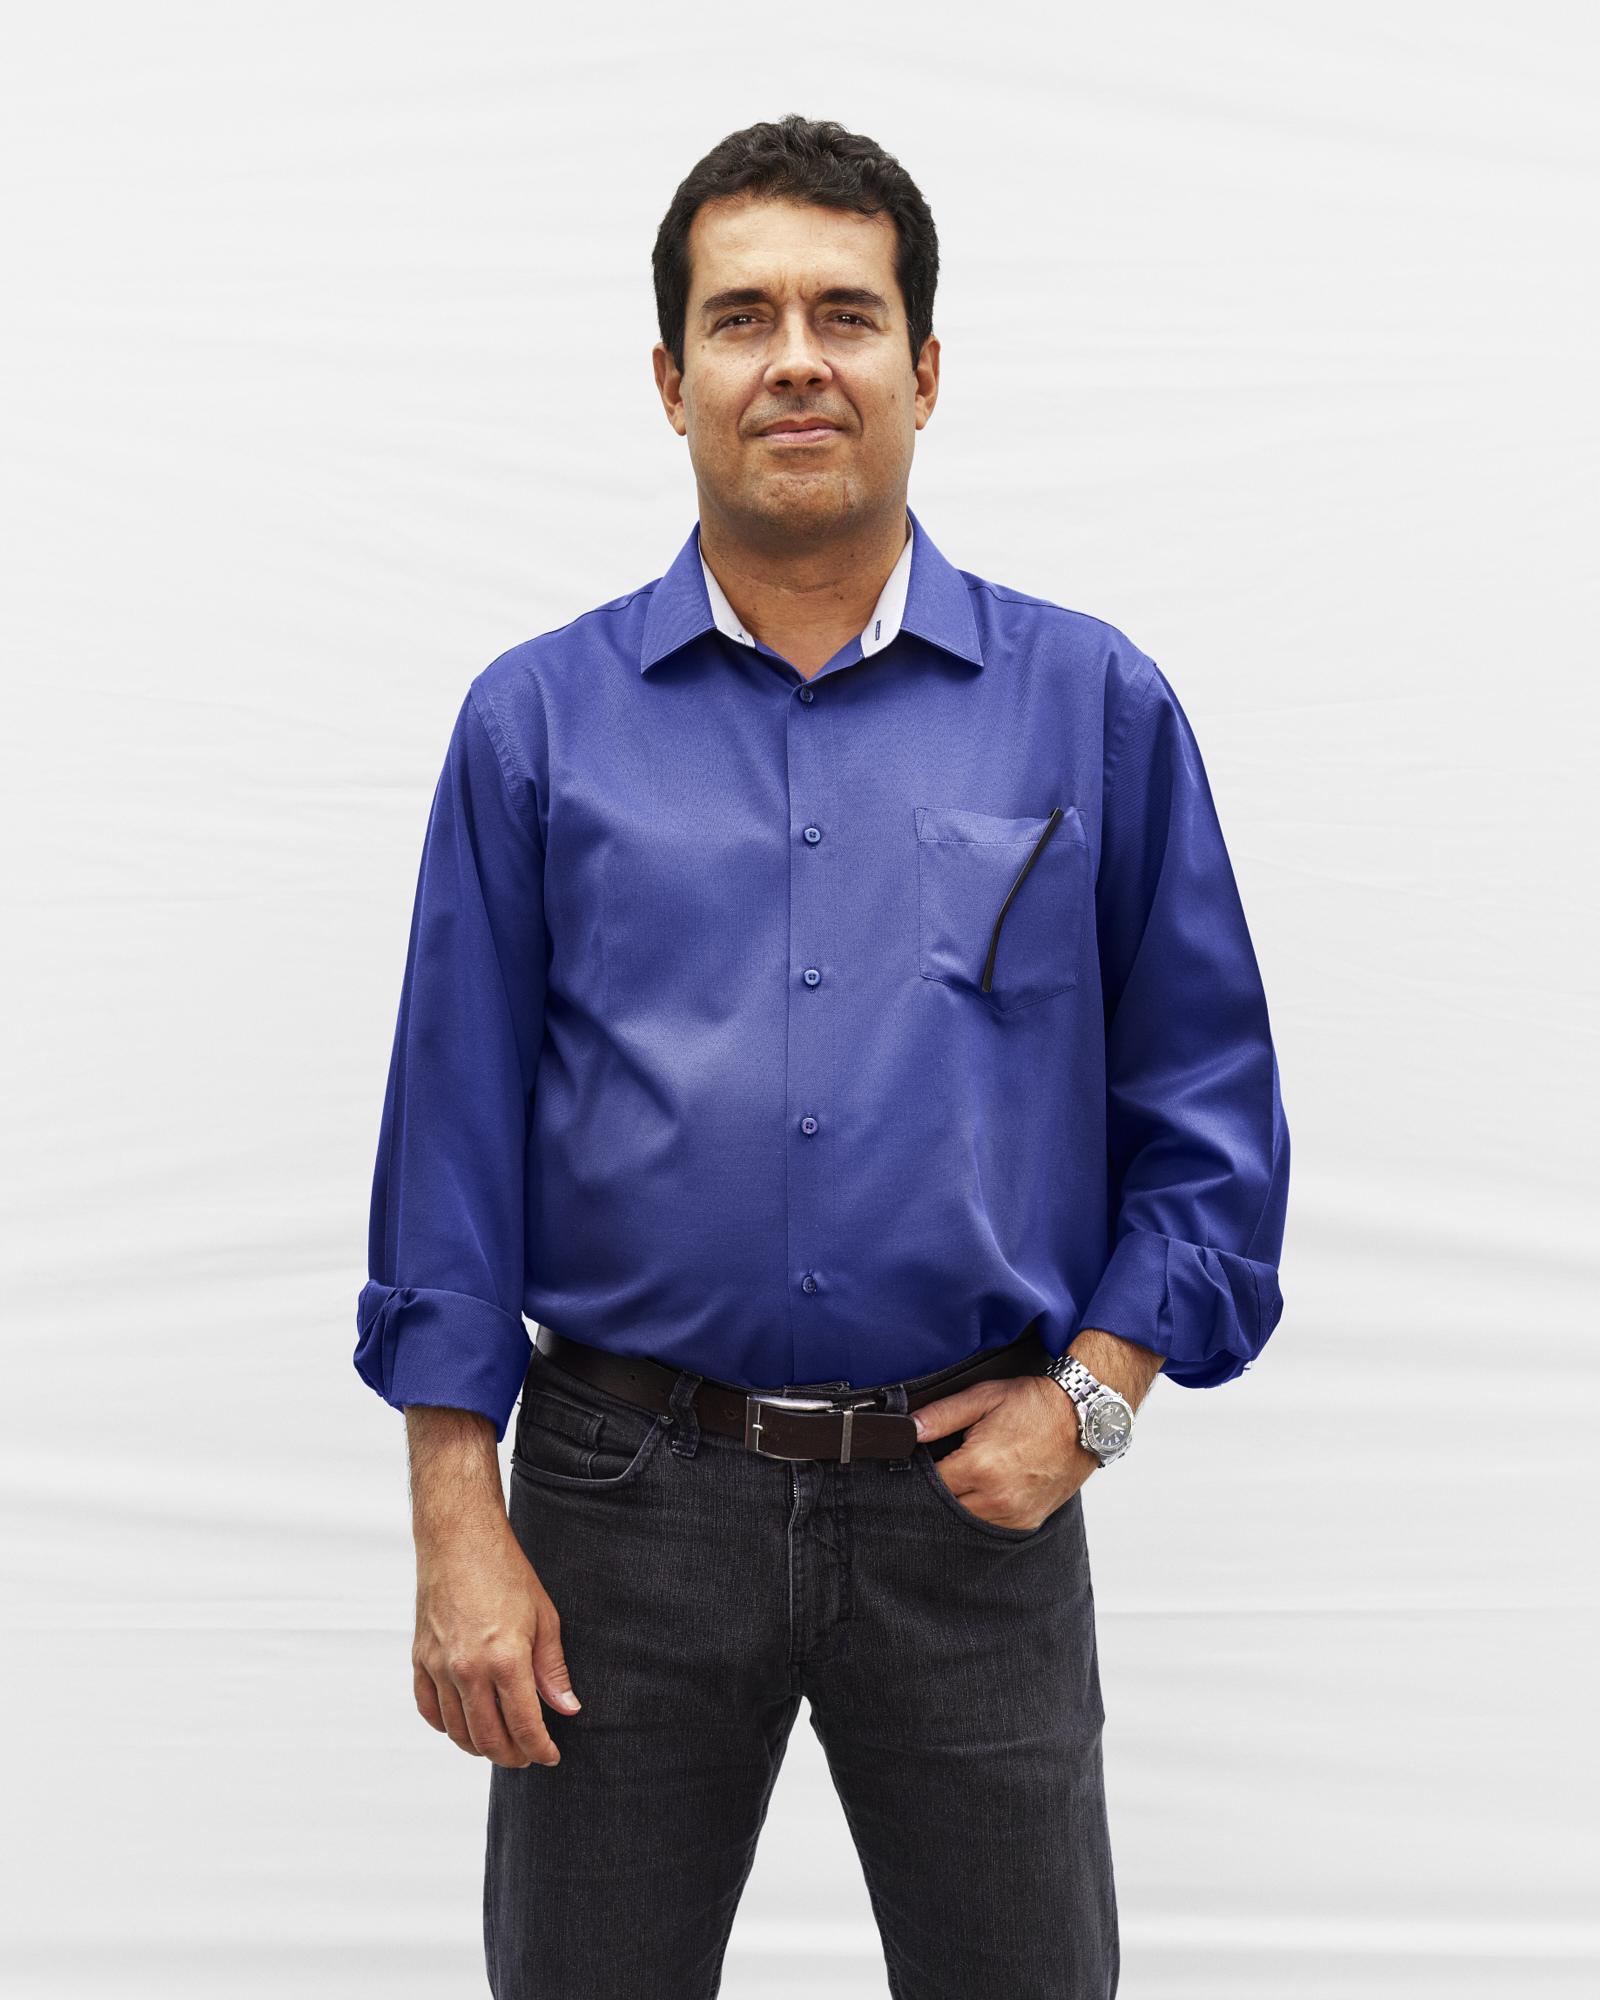 André Trigueiro Mendes